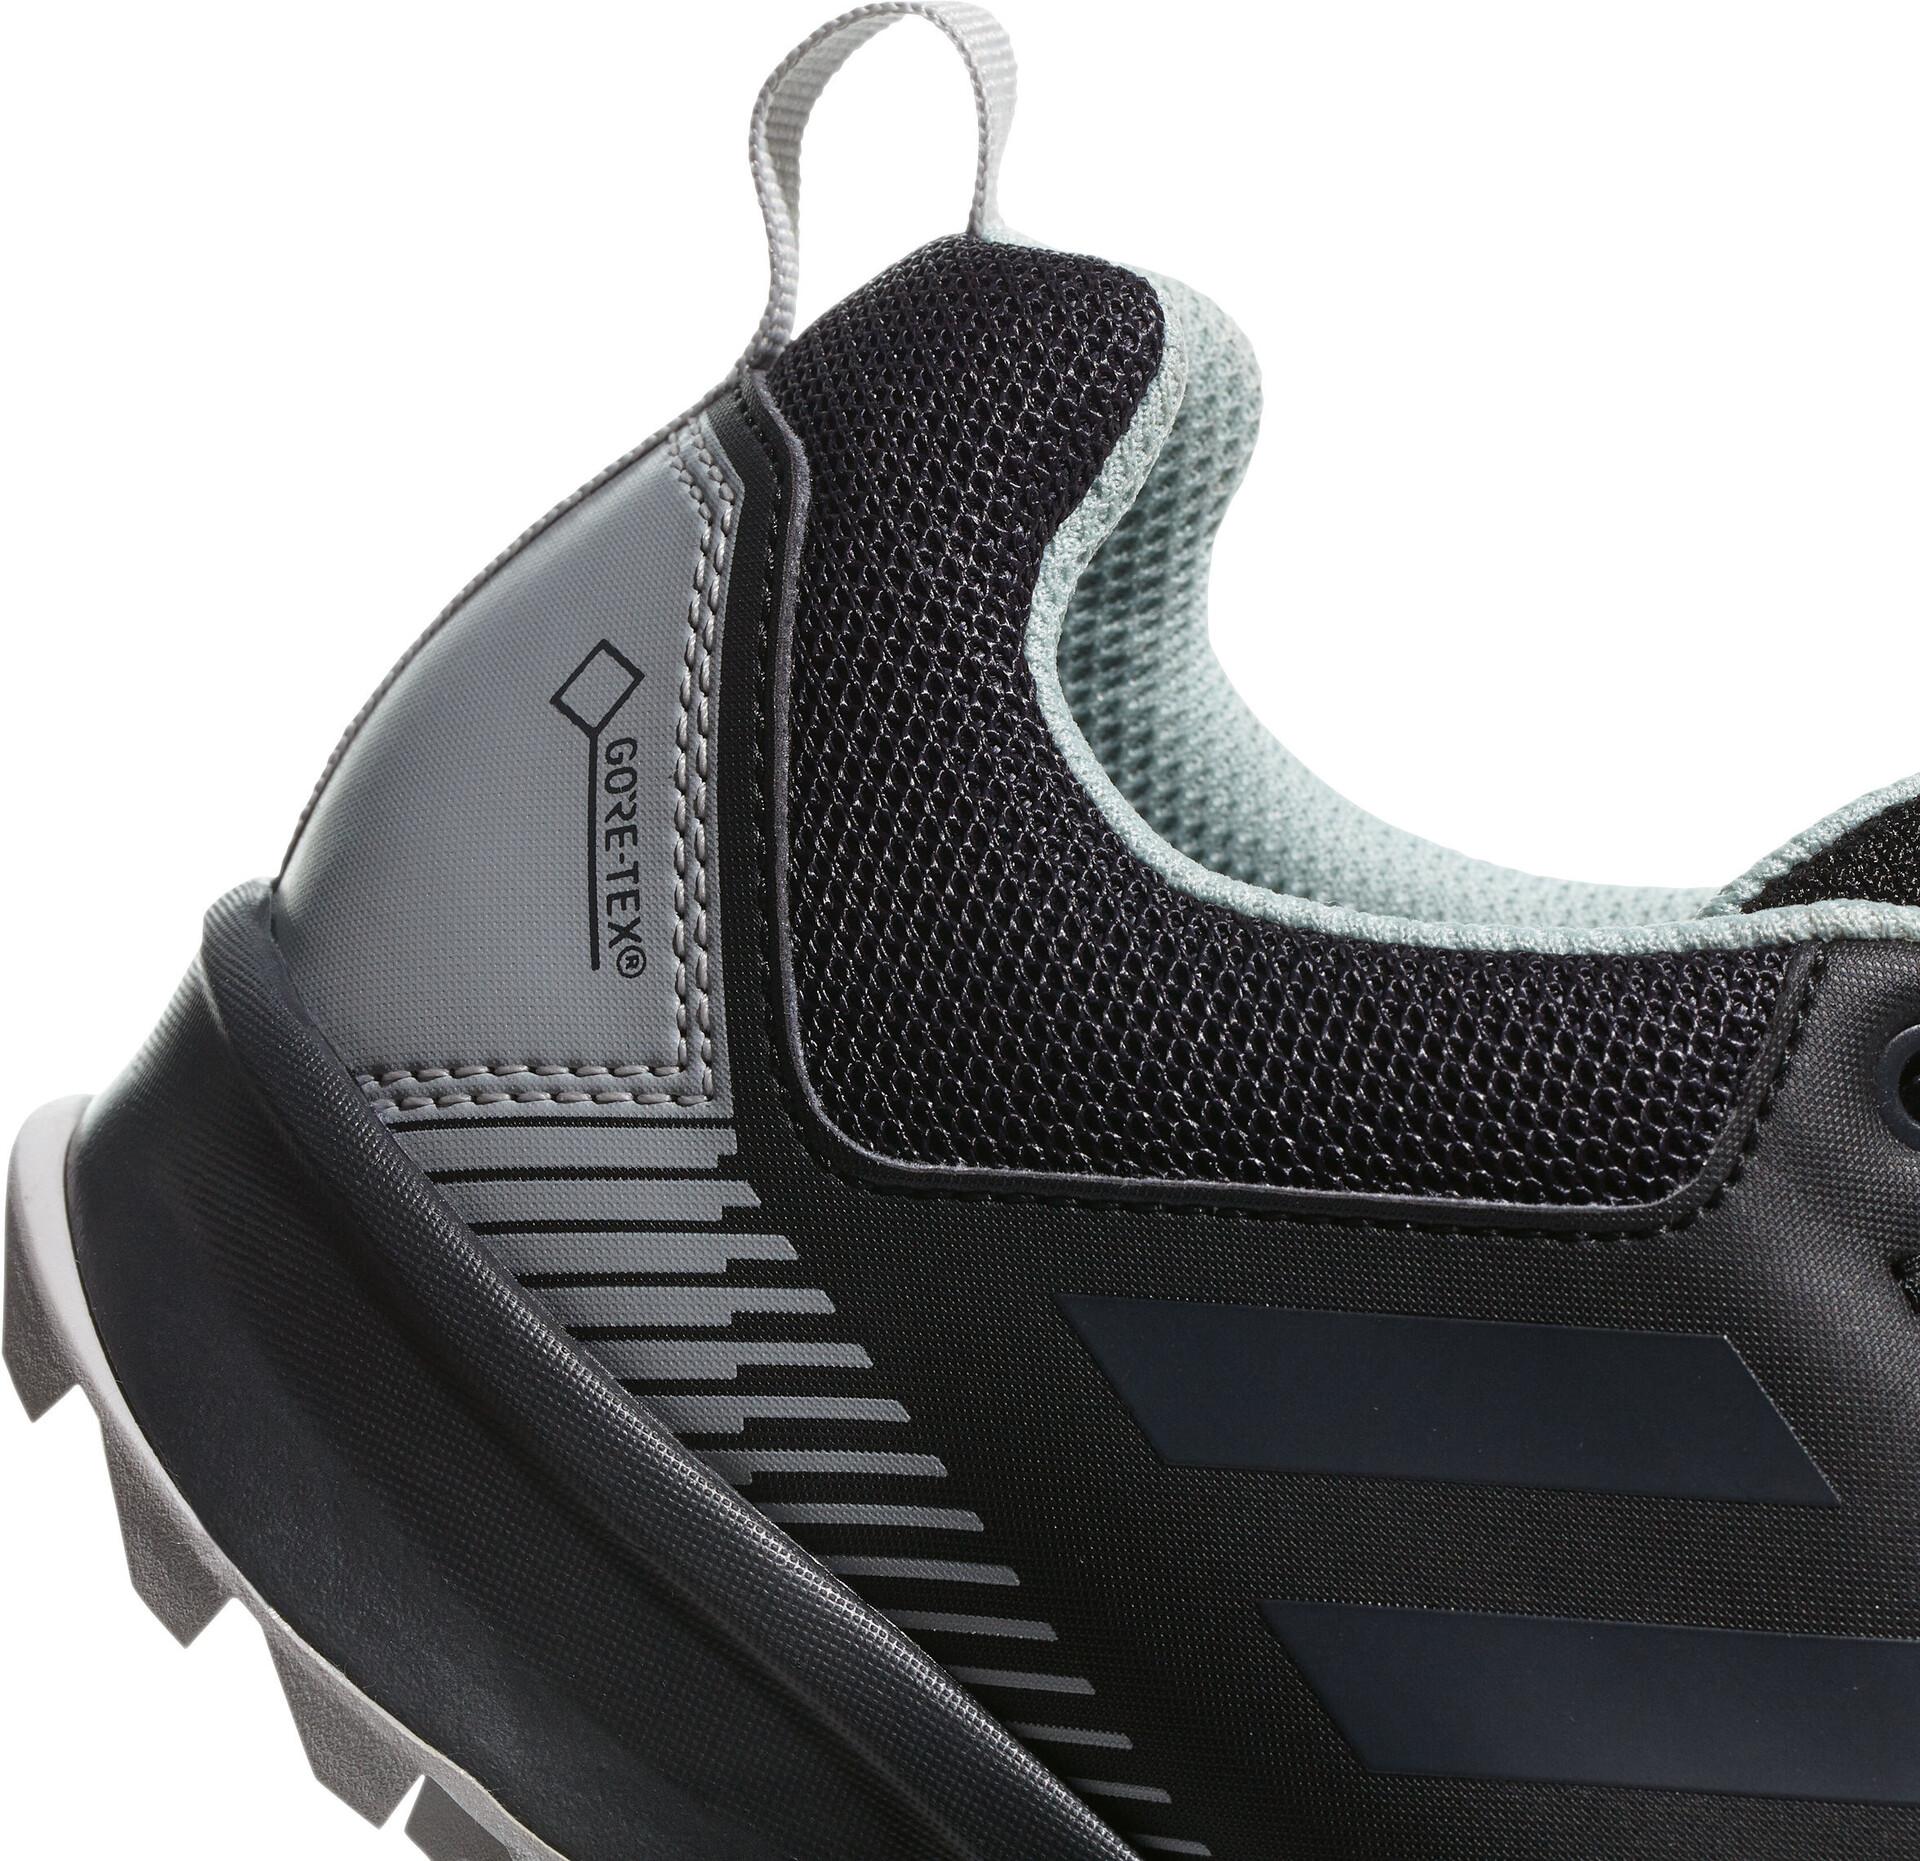 adidas TERREX TraceRocker GTX Trail Running Shoes Damen core blackcarbonash green